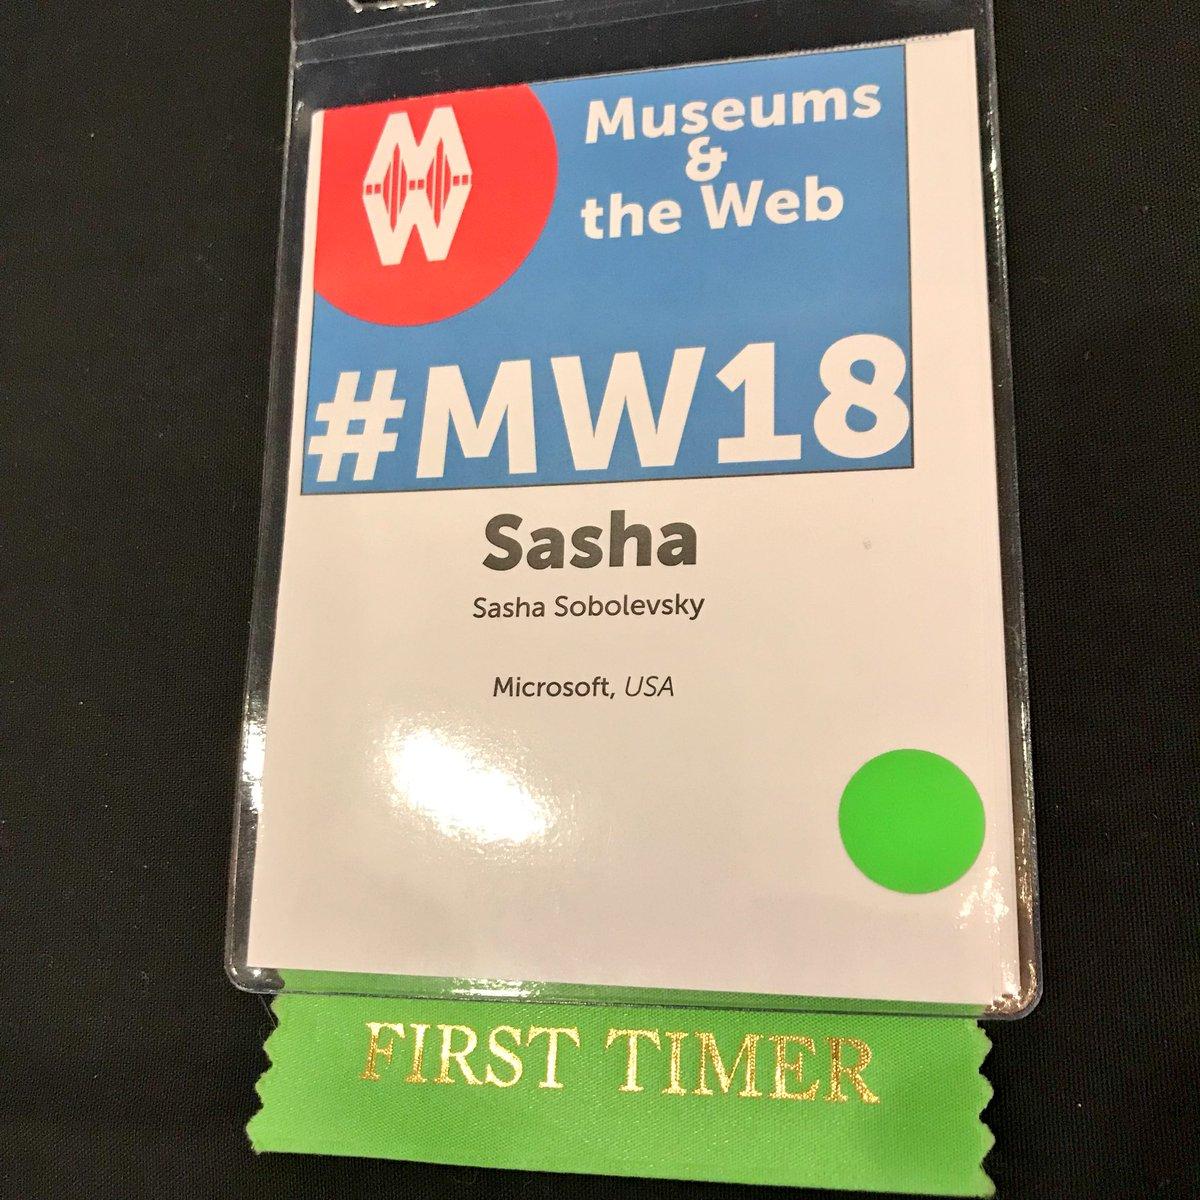 #MW18